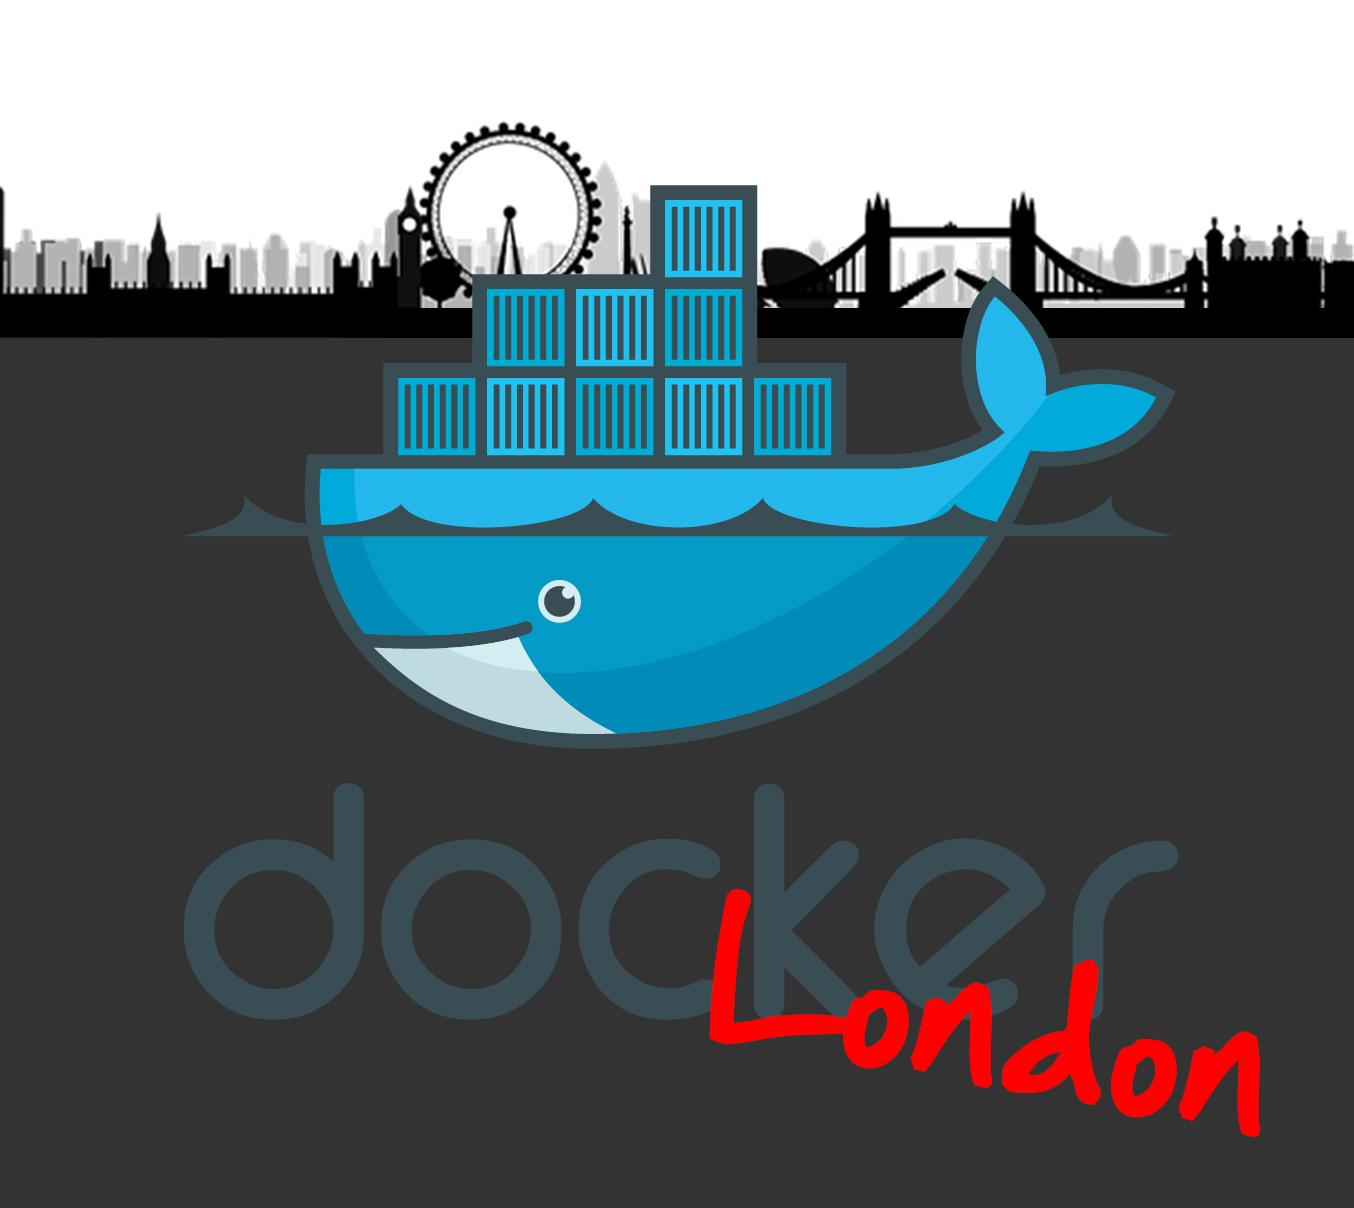 Docker London image